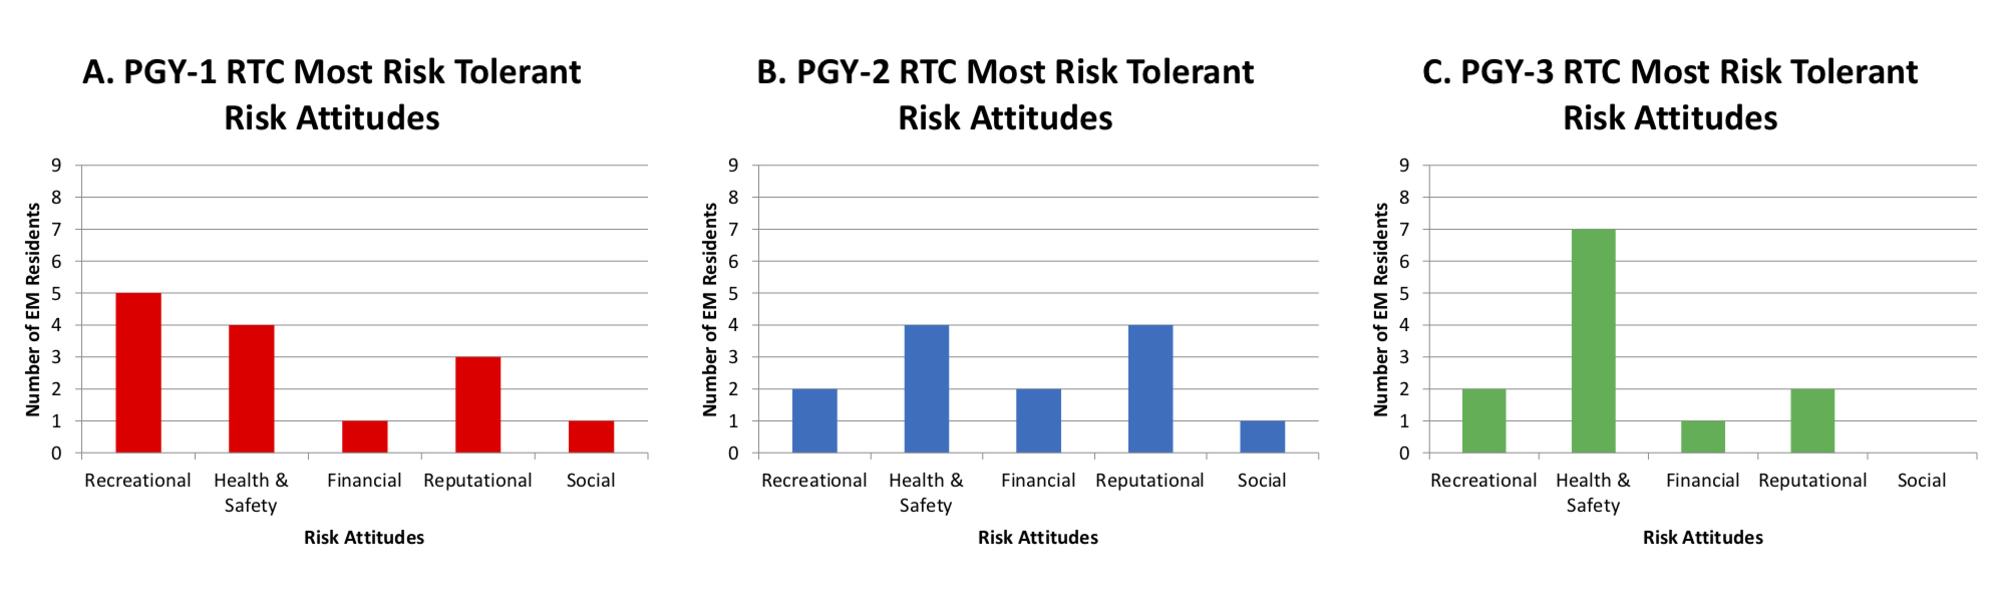 Cureus | An Evaluation of Risk Attitudes and Risk Tolerance